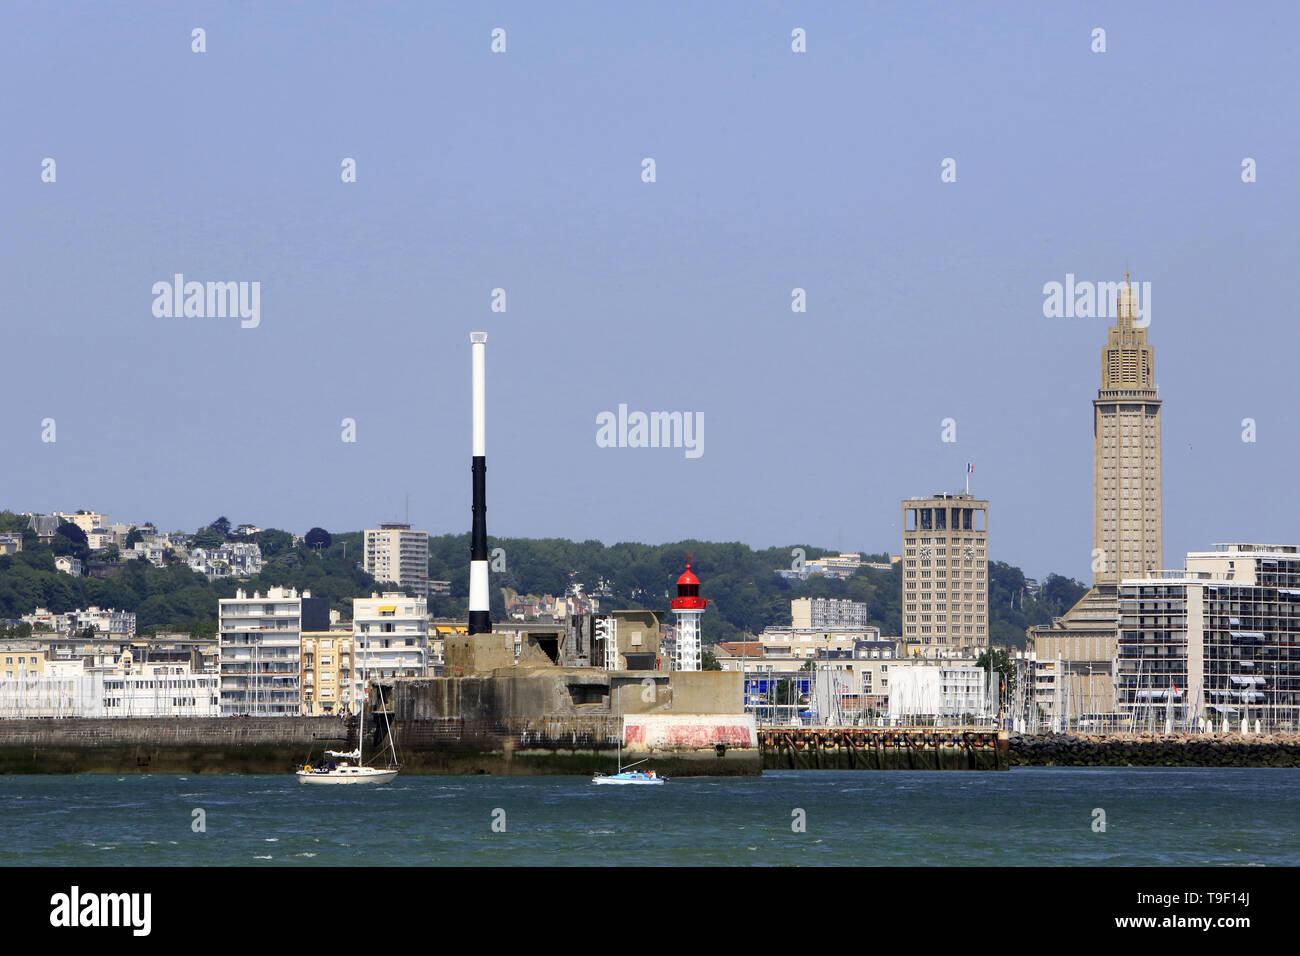 Seaside. Le Havre. - Stock Image